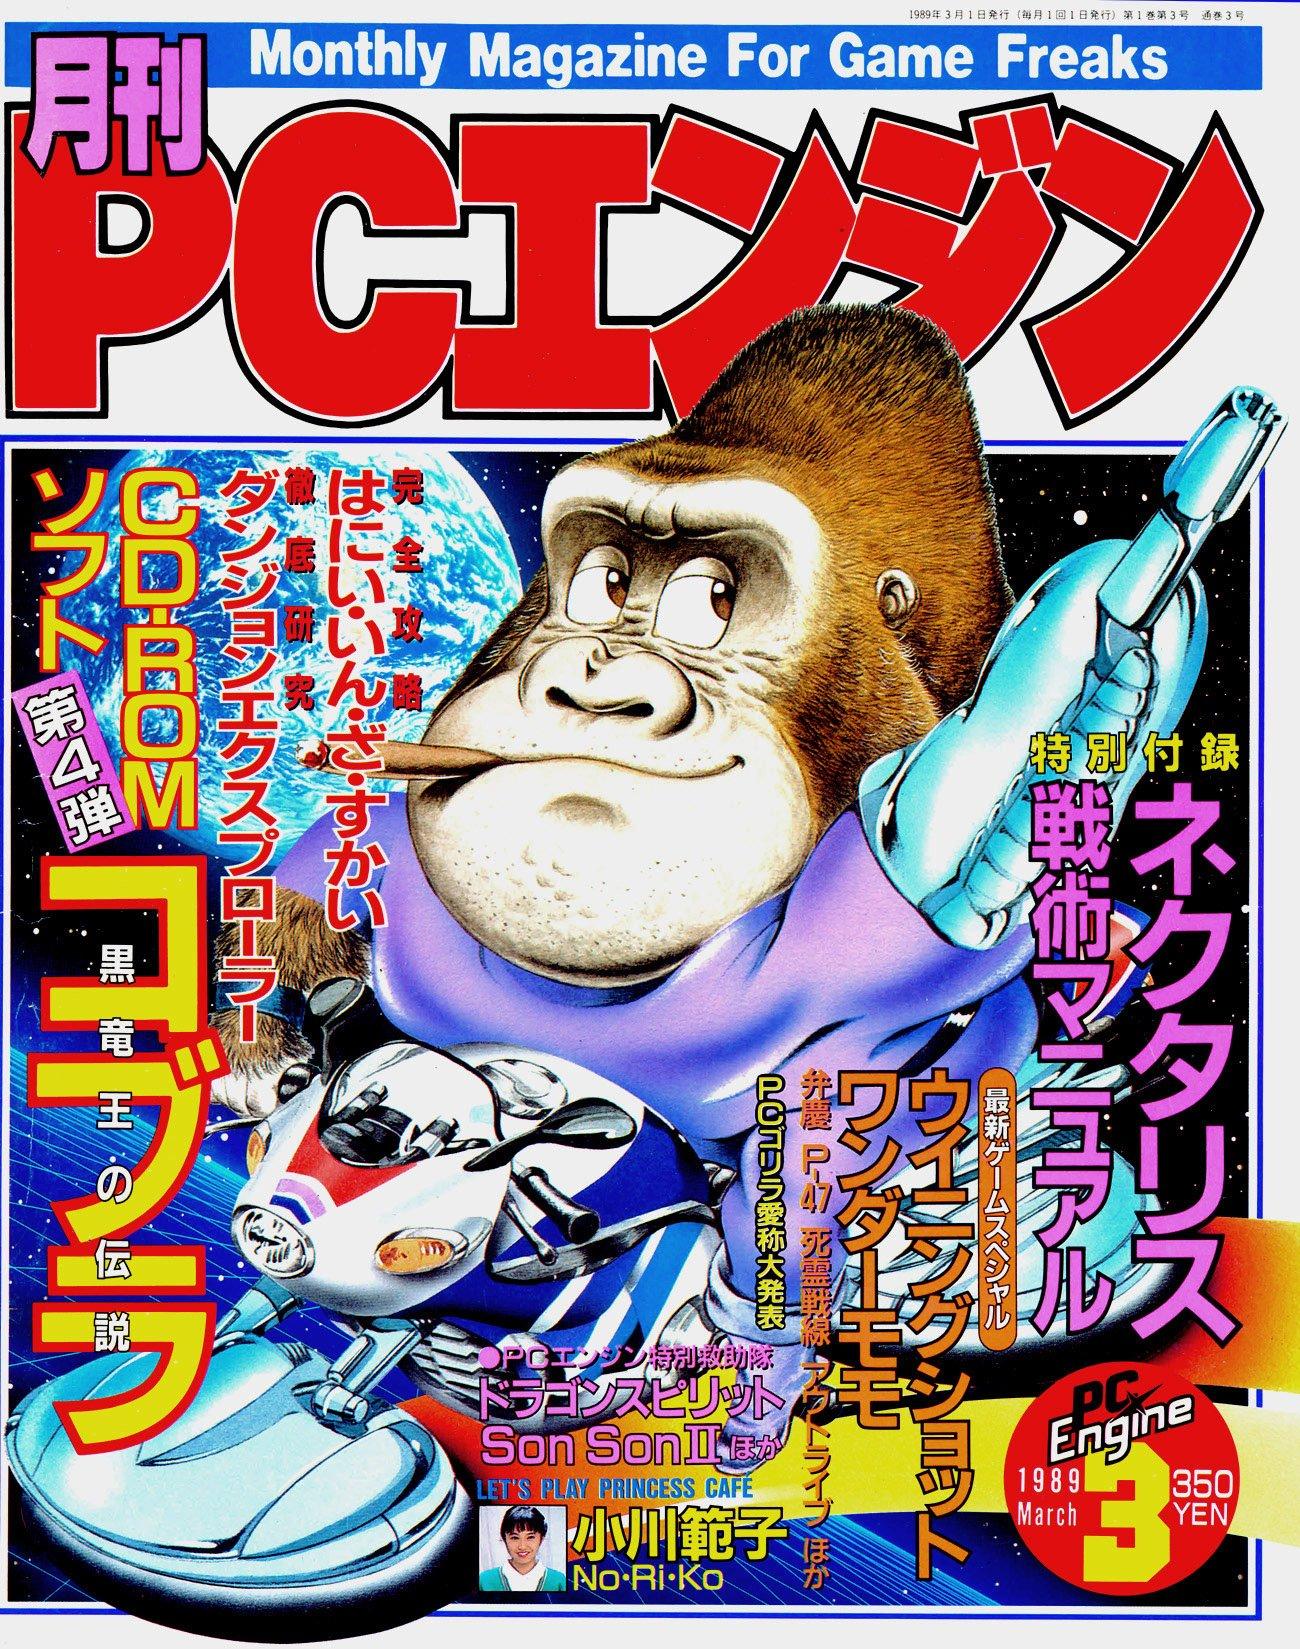 Gekkan PC Engine Issue 03 (March 1989)